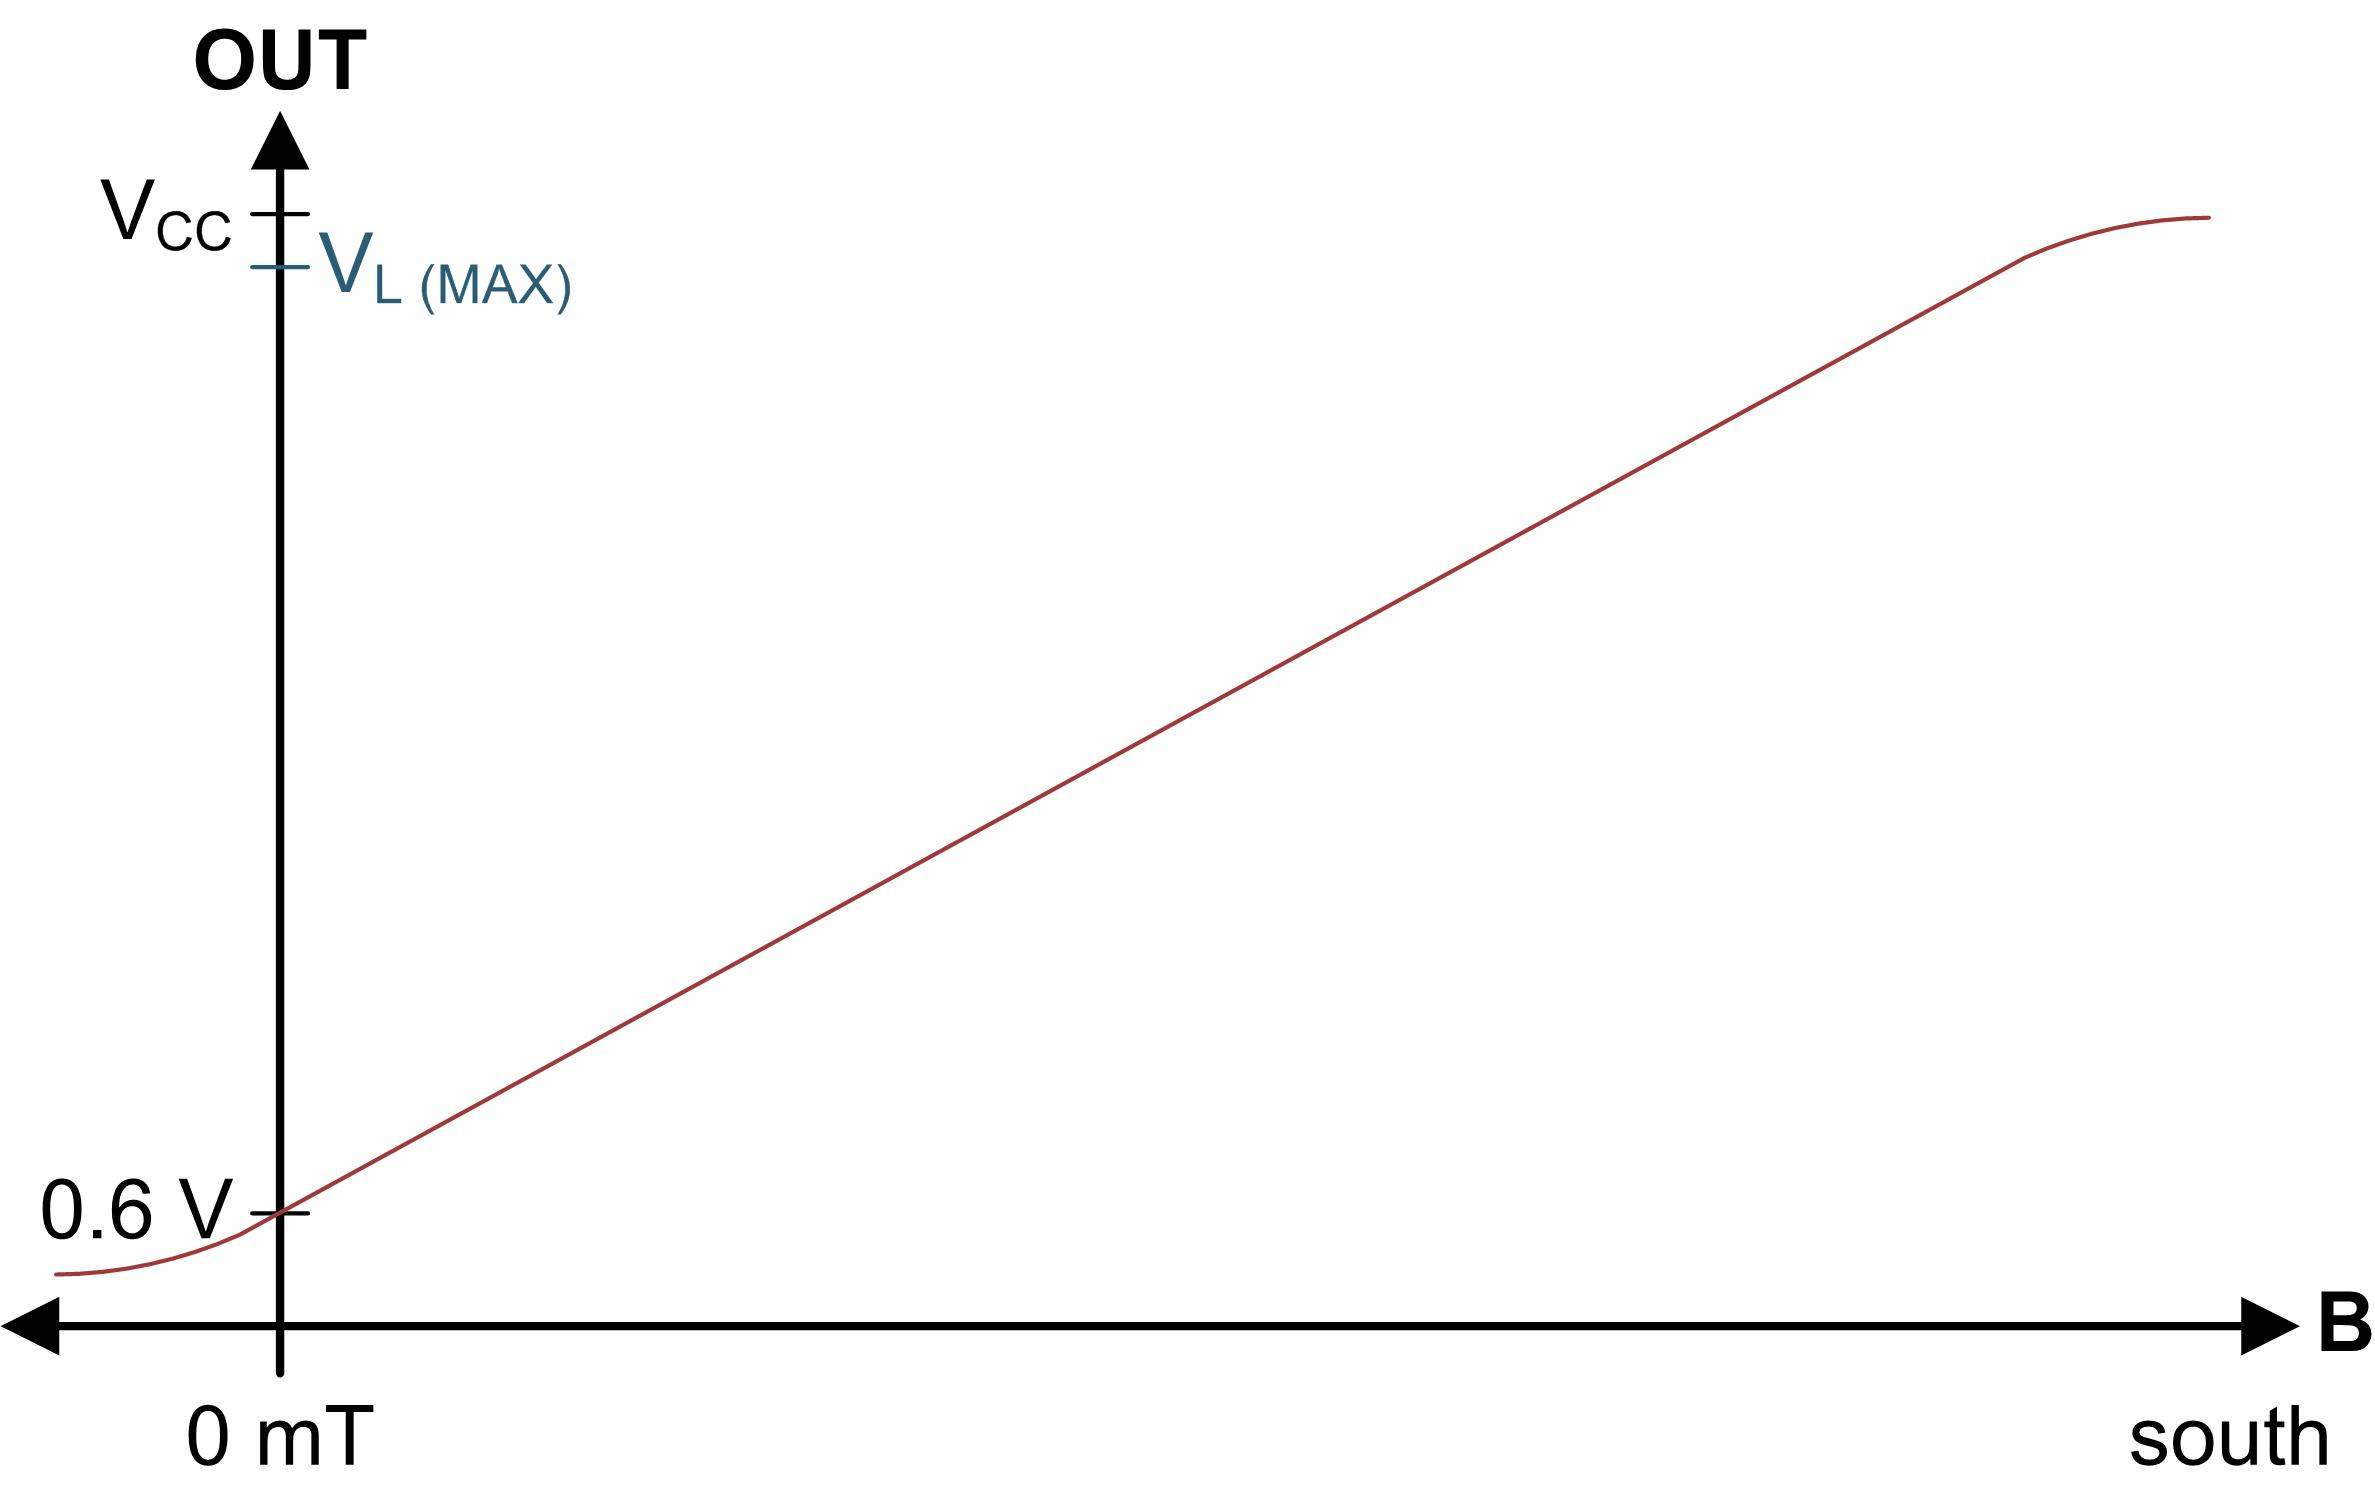 Figure 4: DRV5056 output